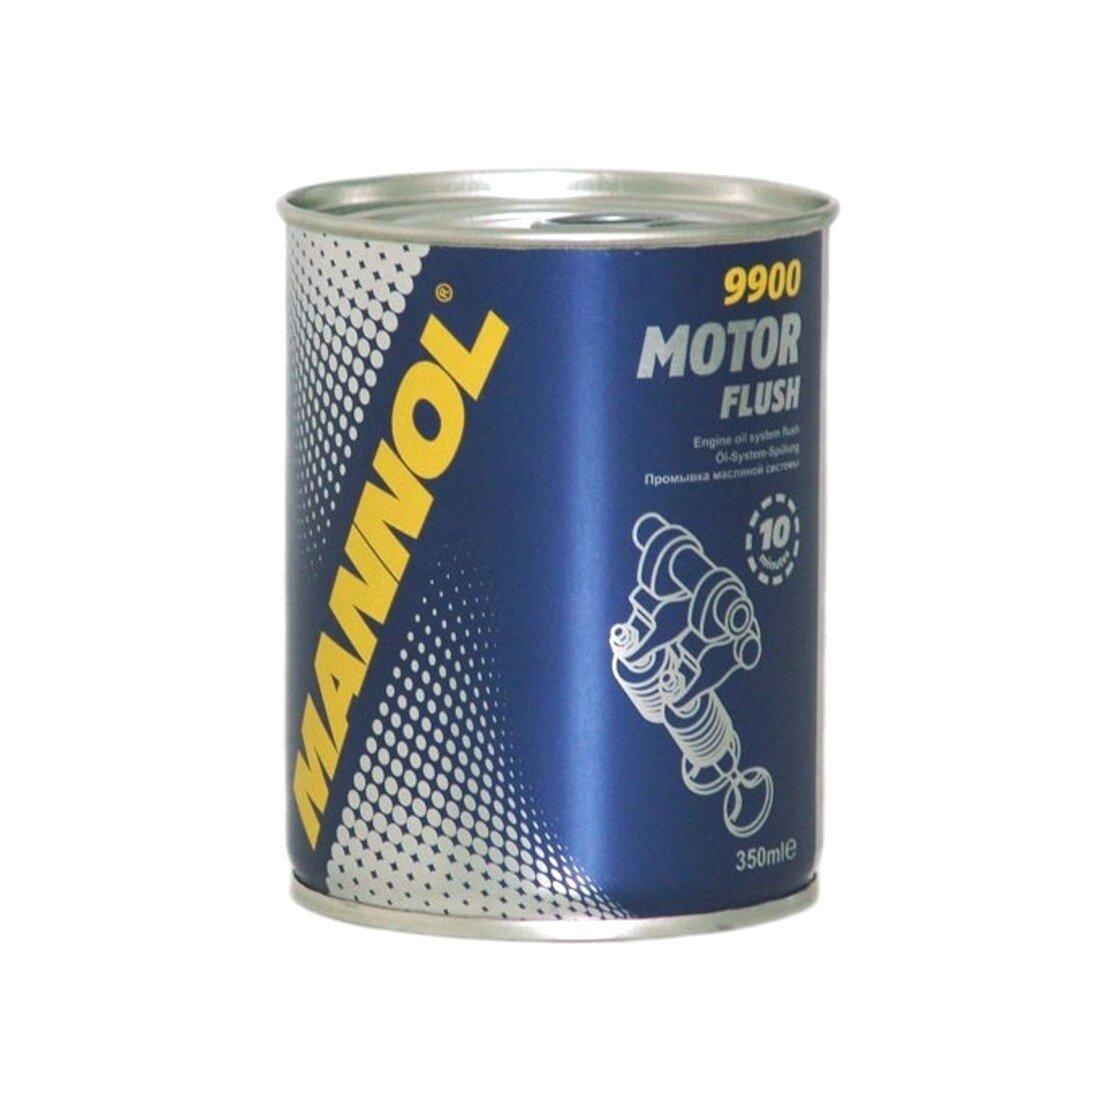 1 x MANNOL Motorö l System Spü lung 9900 350ml